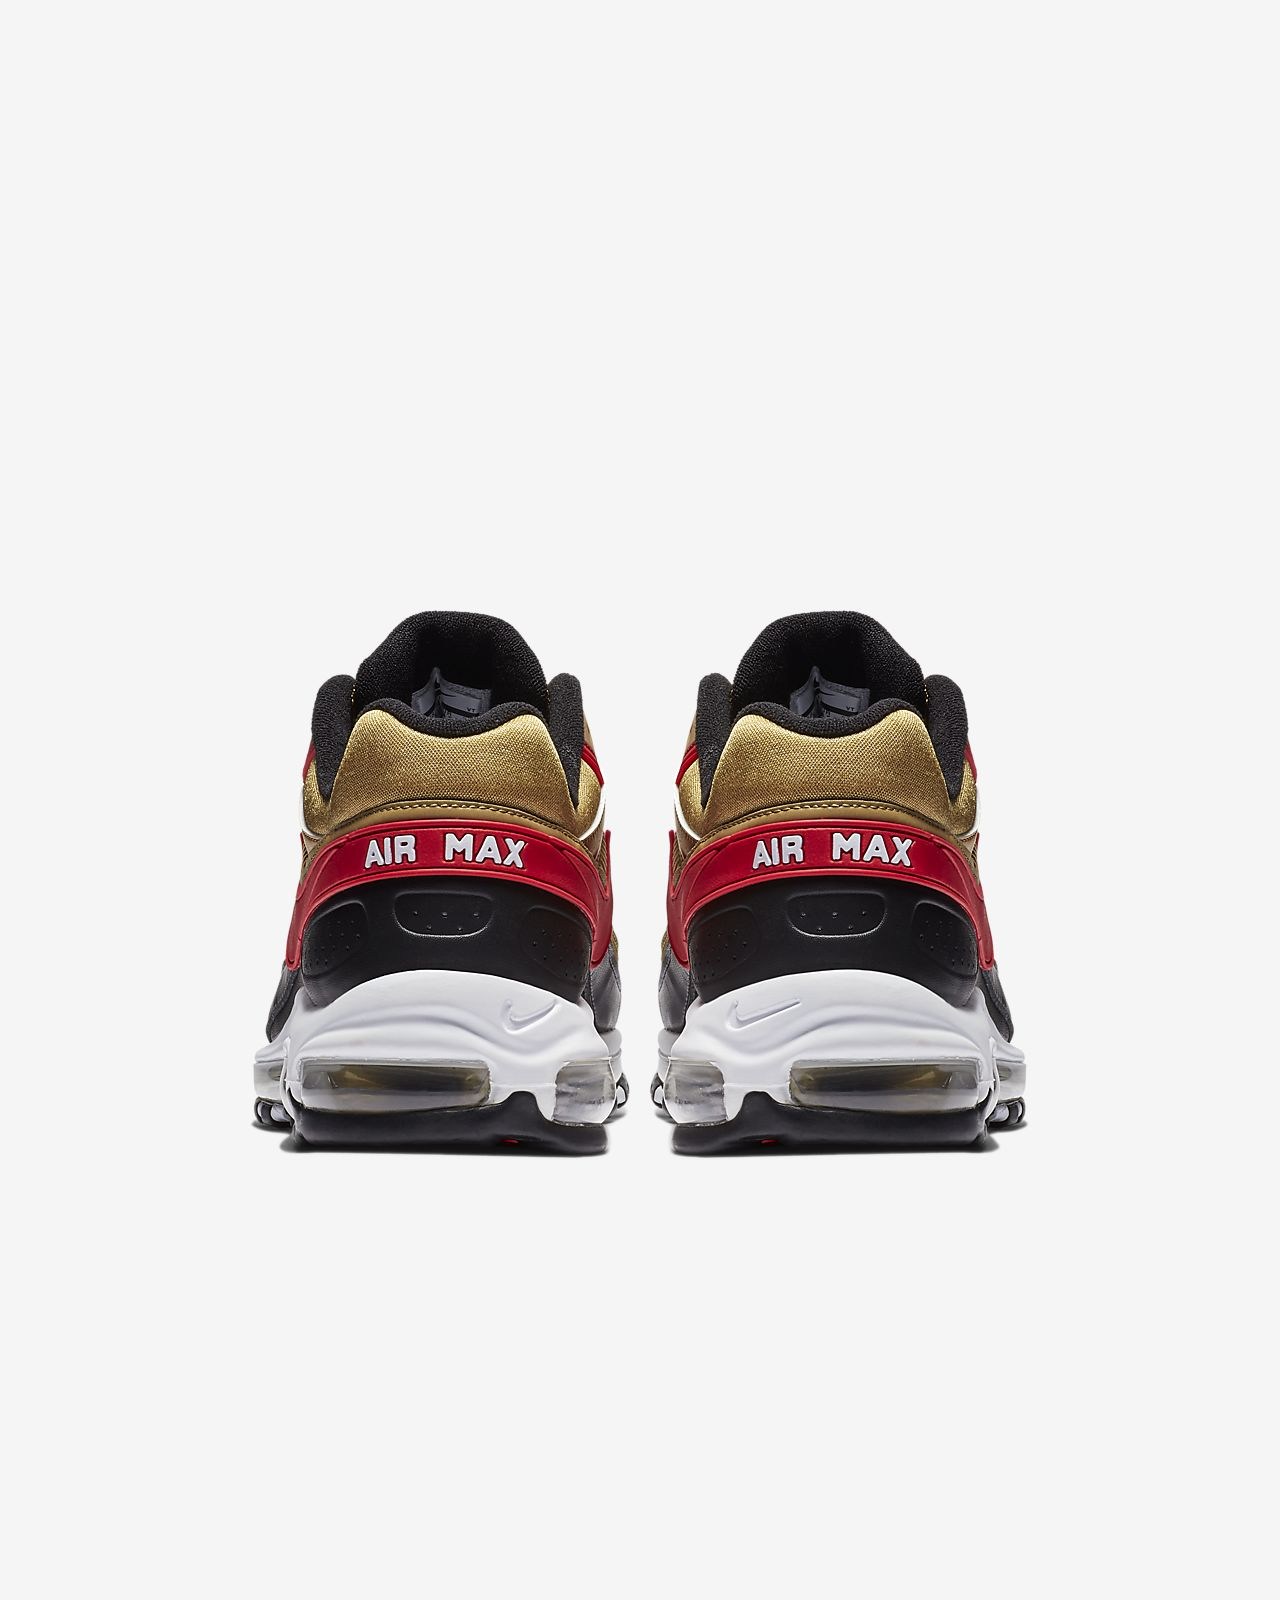 online store d867a c0613 ... Sko Nike Air Max 97 BW för män